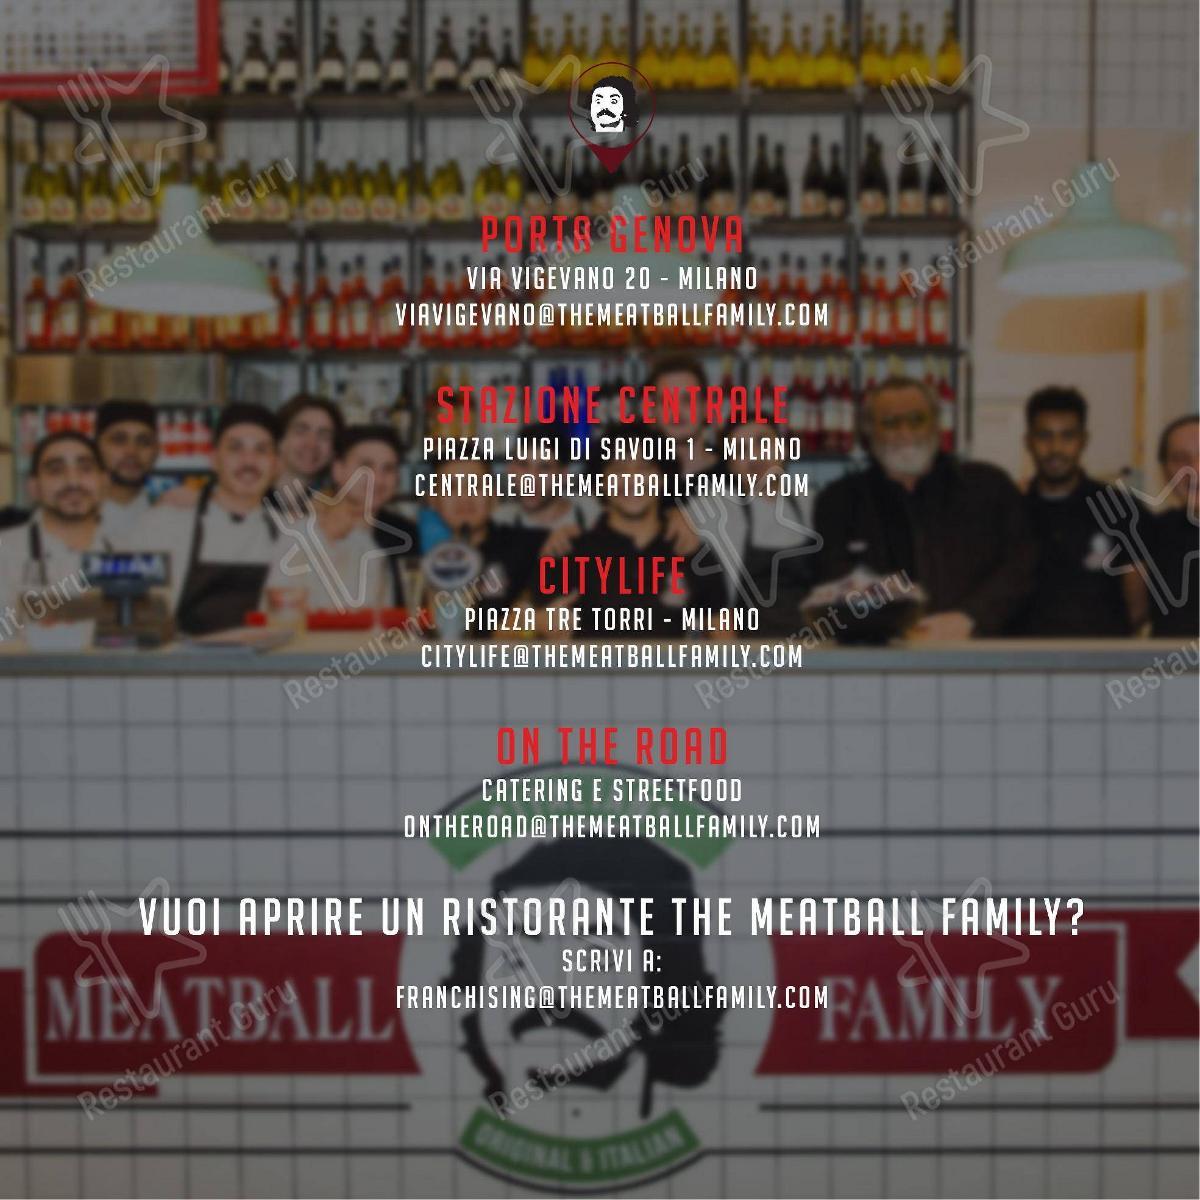 Seht euch die Speisekarte von Meatball Family an